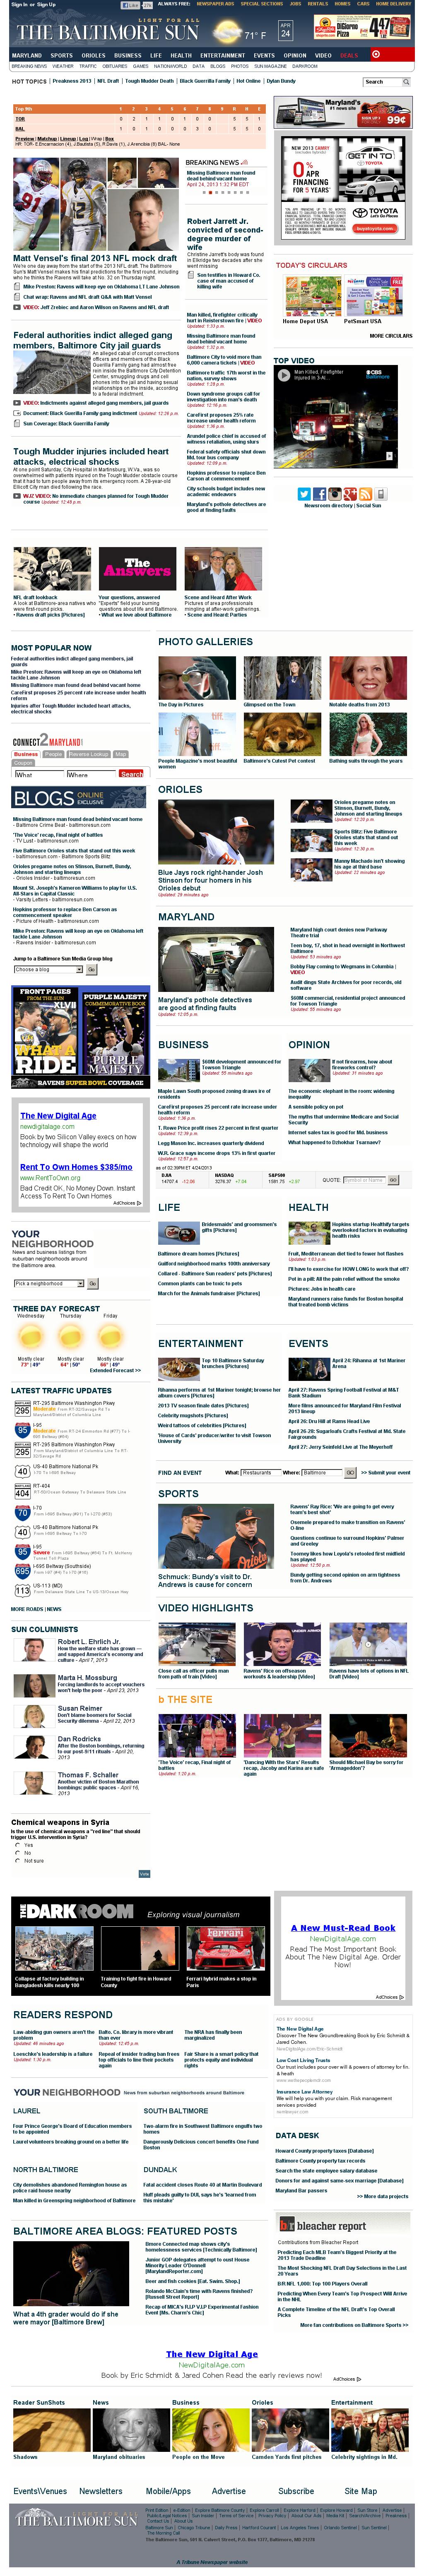 The Baltimore Sun at Wednesday April 24, 2013, 7:01 p.m. UTC